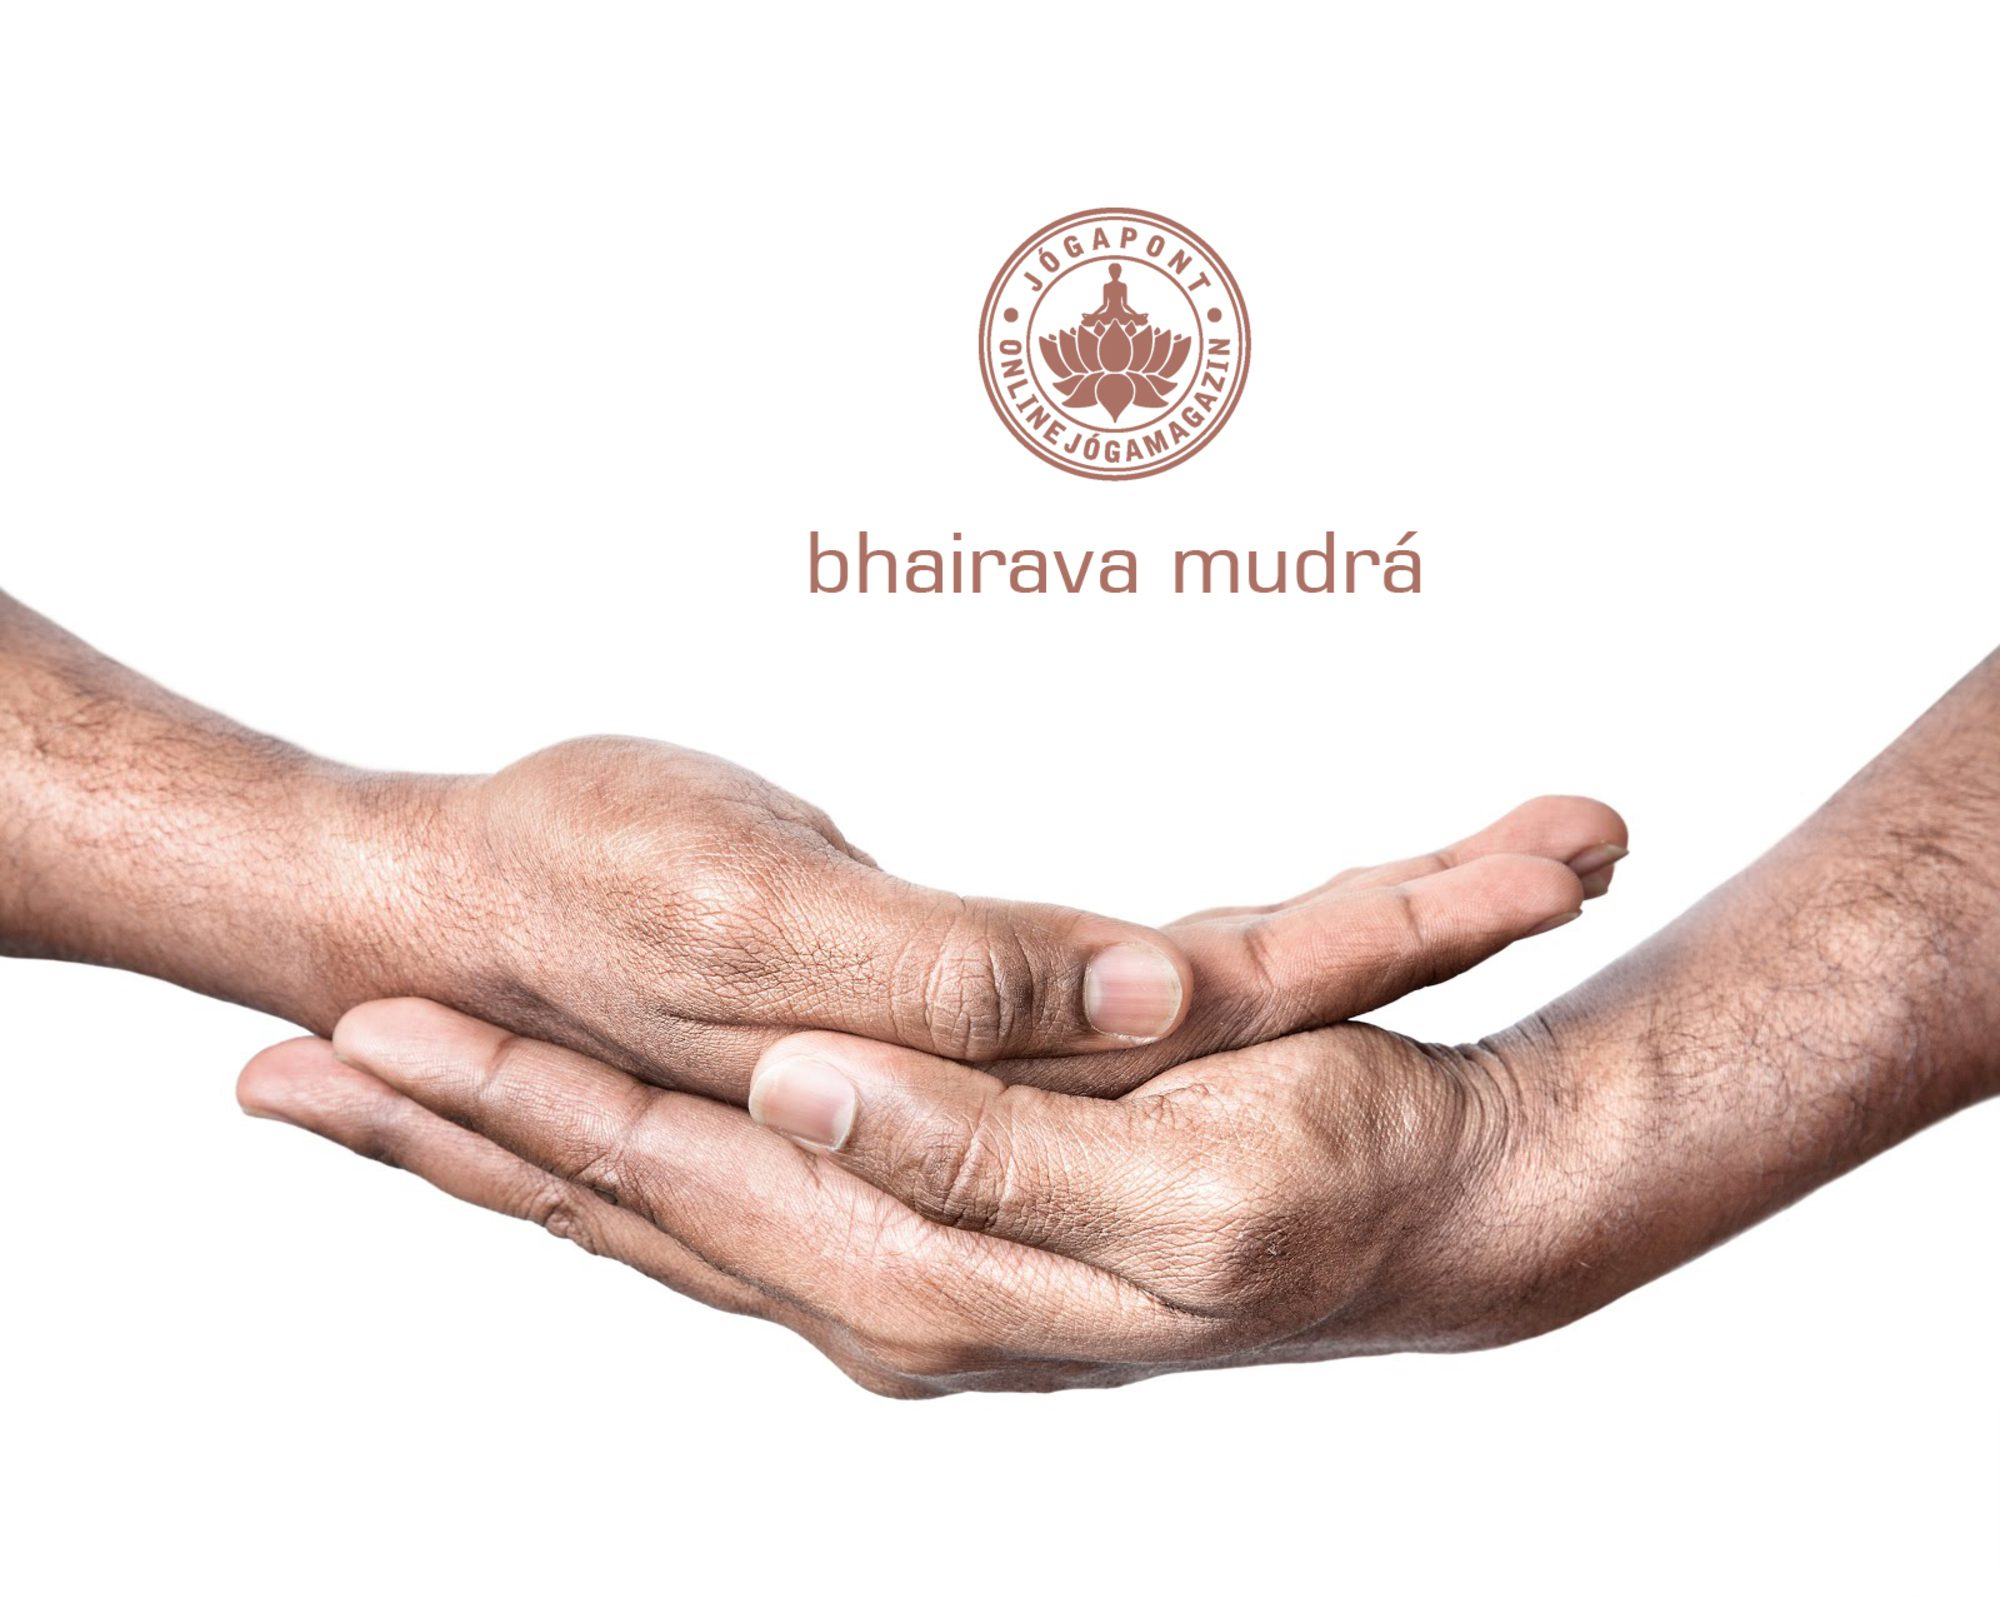 Bhairava mudrá